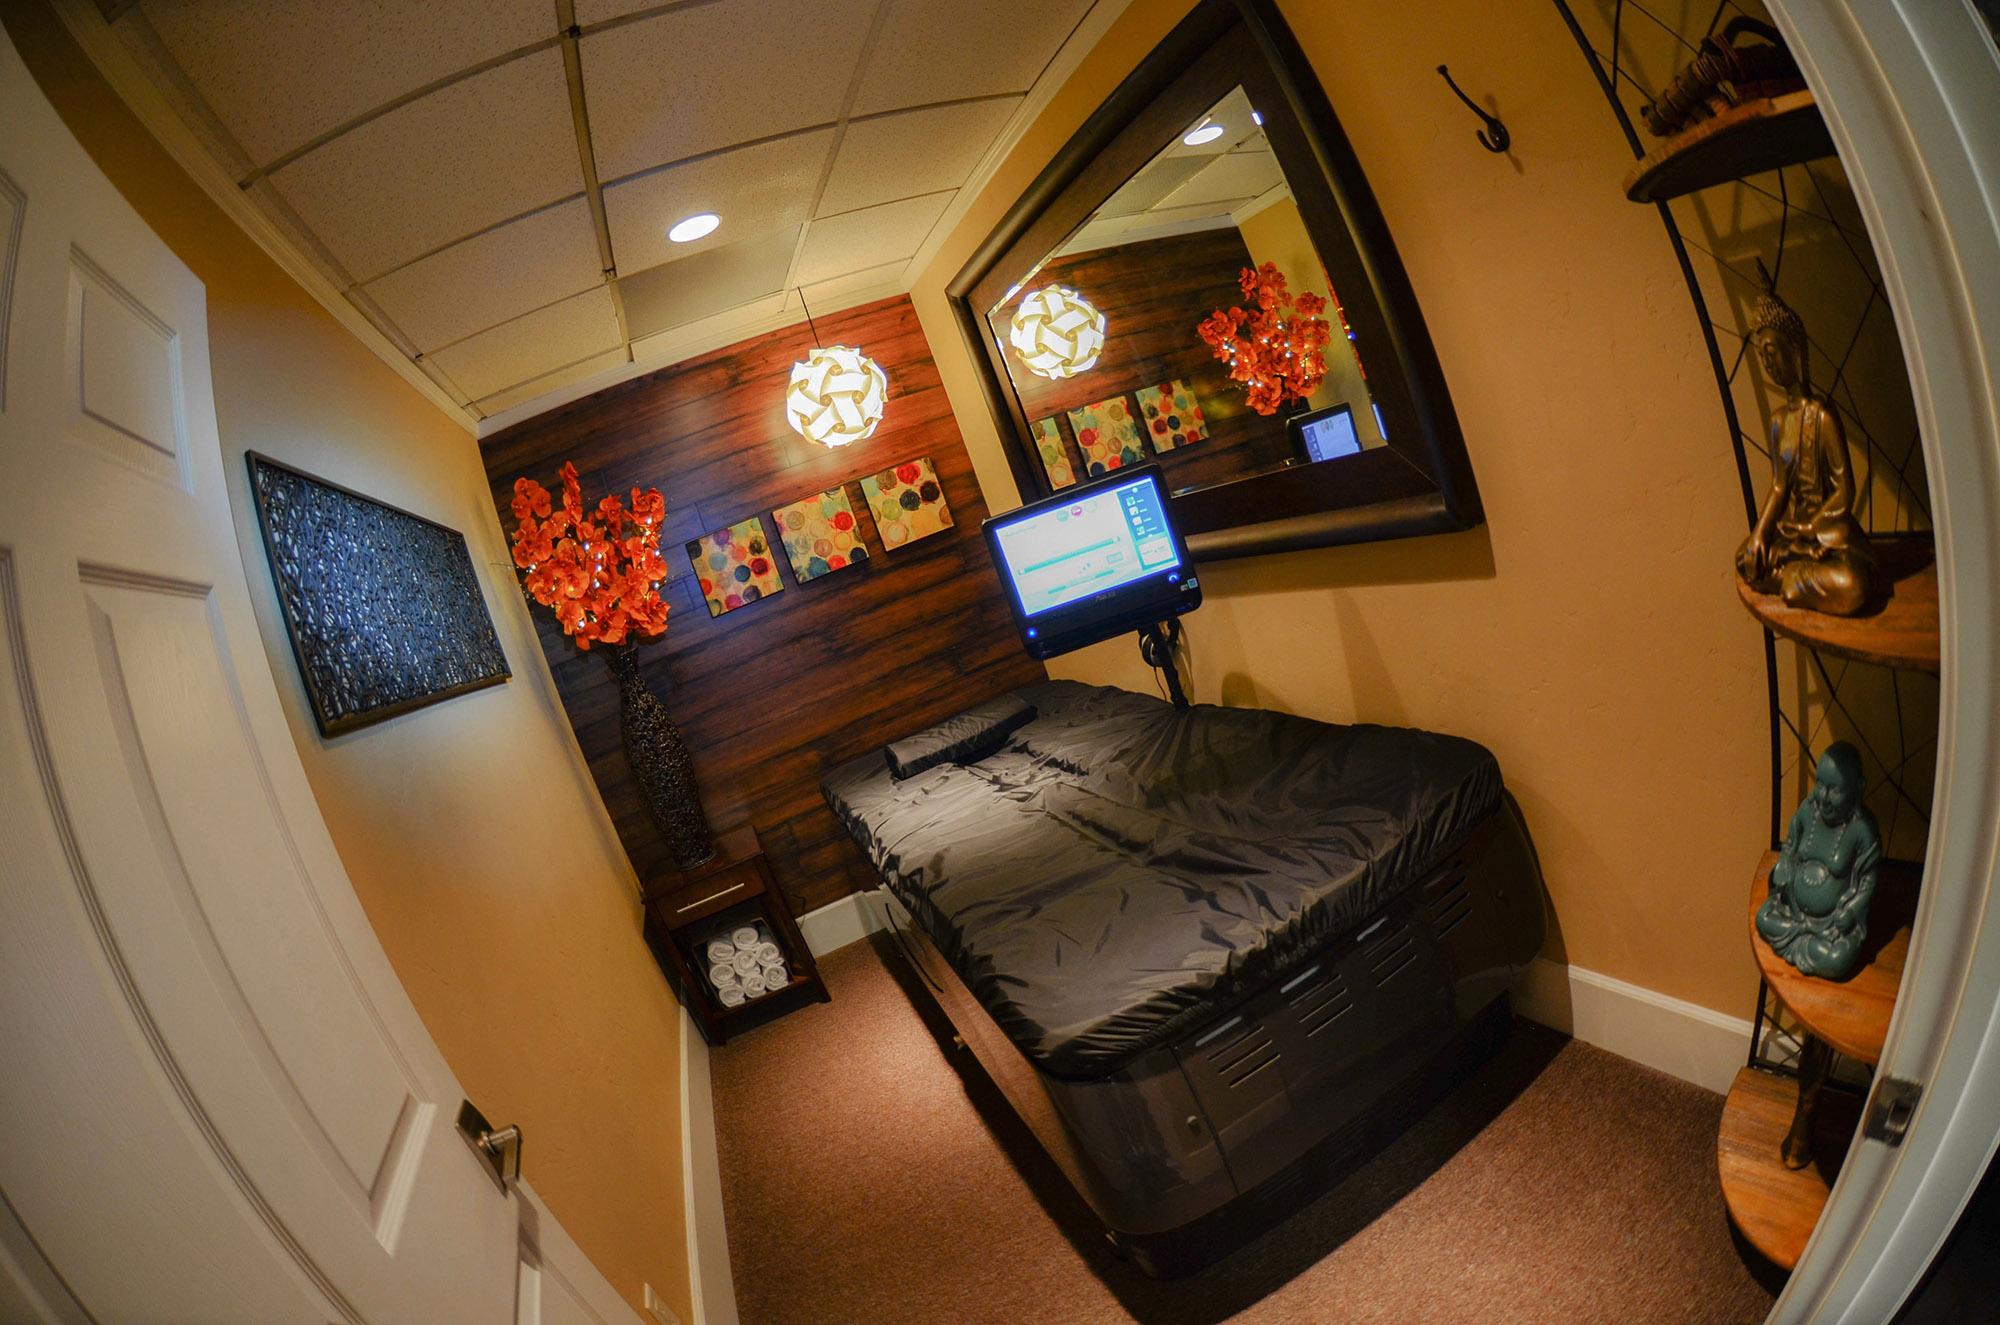 West Valley Chiropractic HydroMassage Room, San Jose, CA